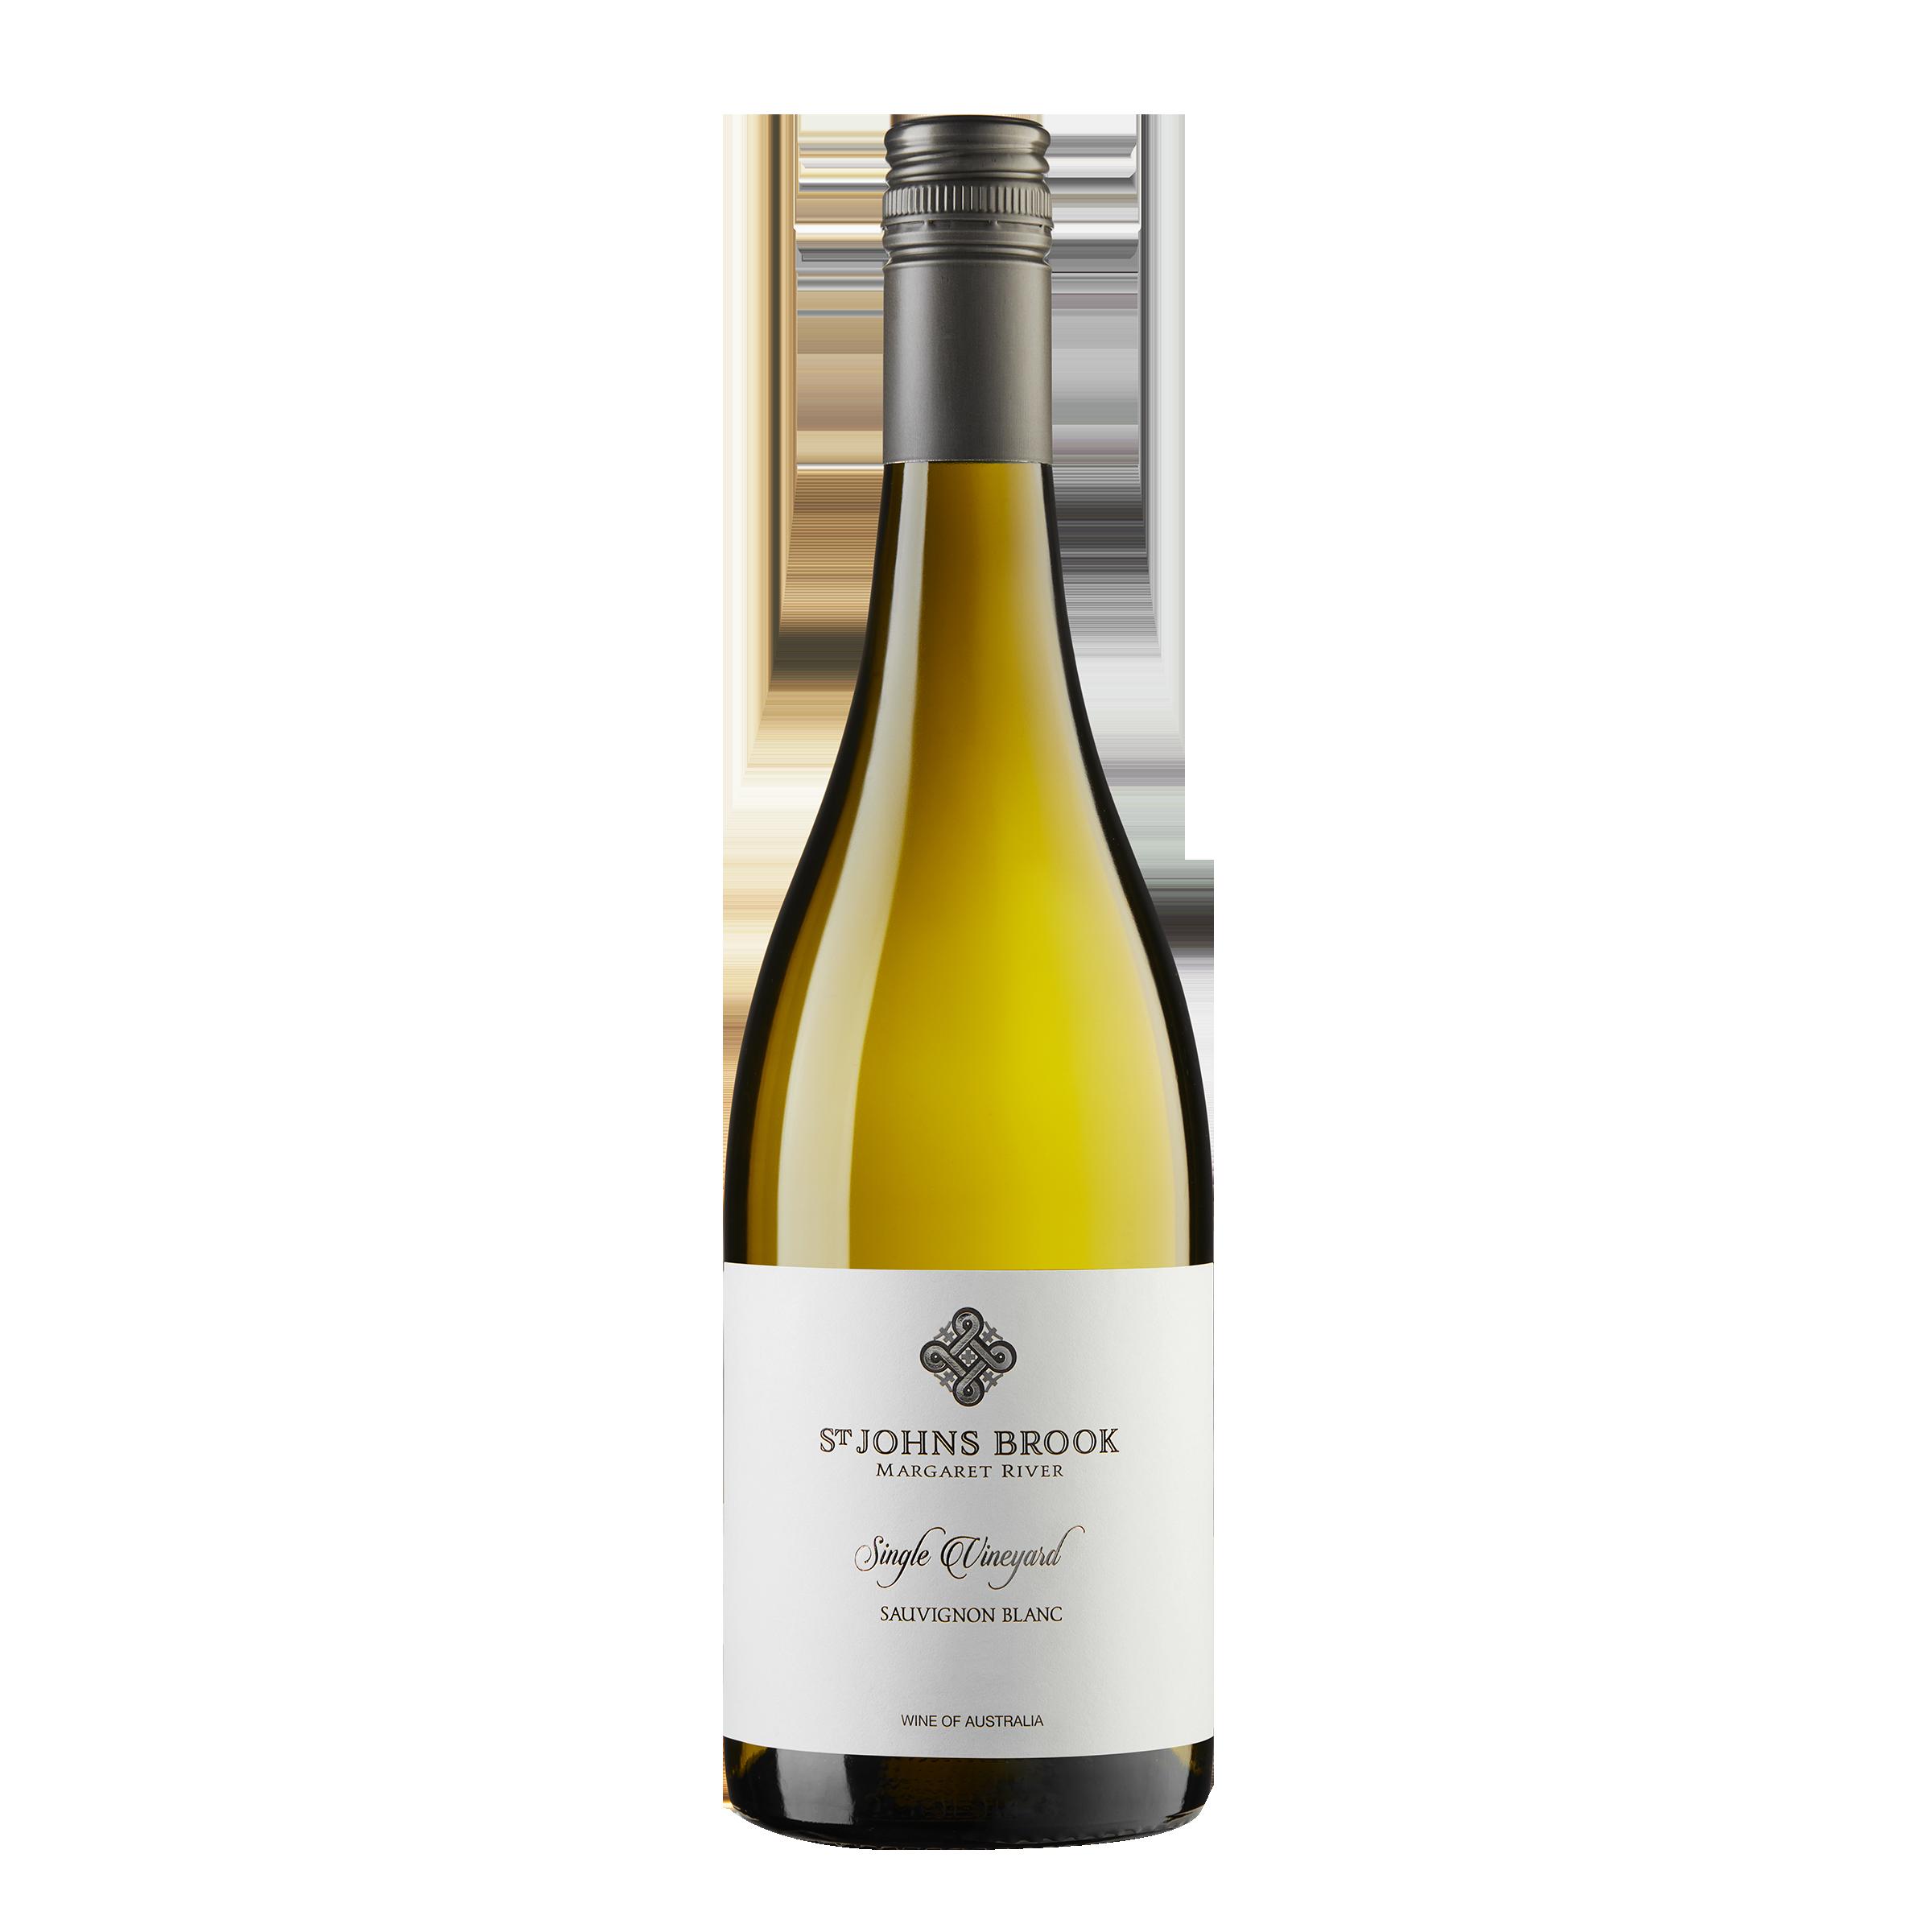 St Johns Brook Single Vineyard Sauvignon Blanc 750ml 2017